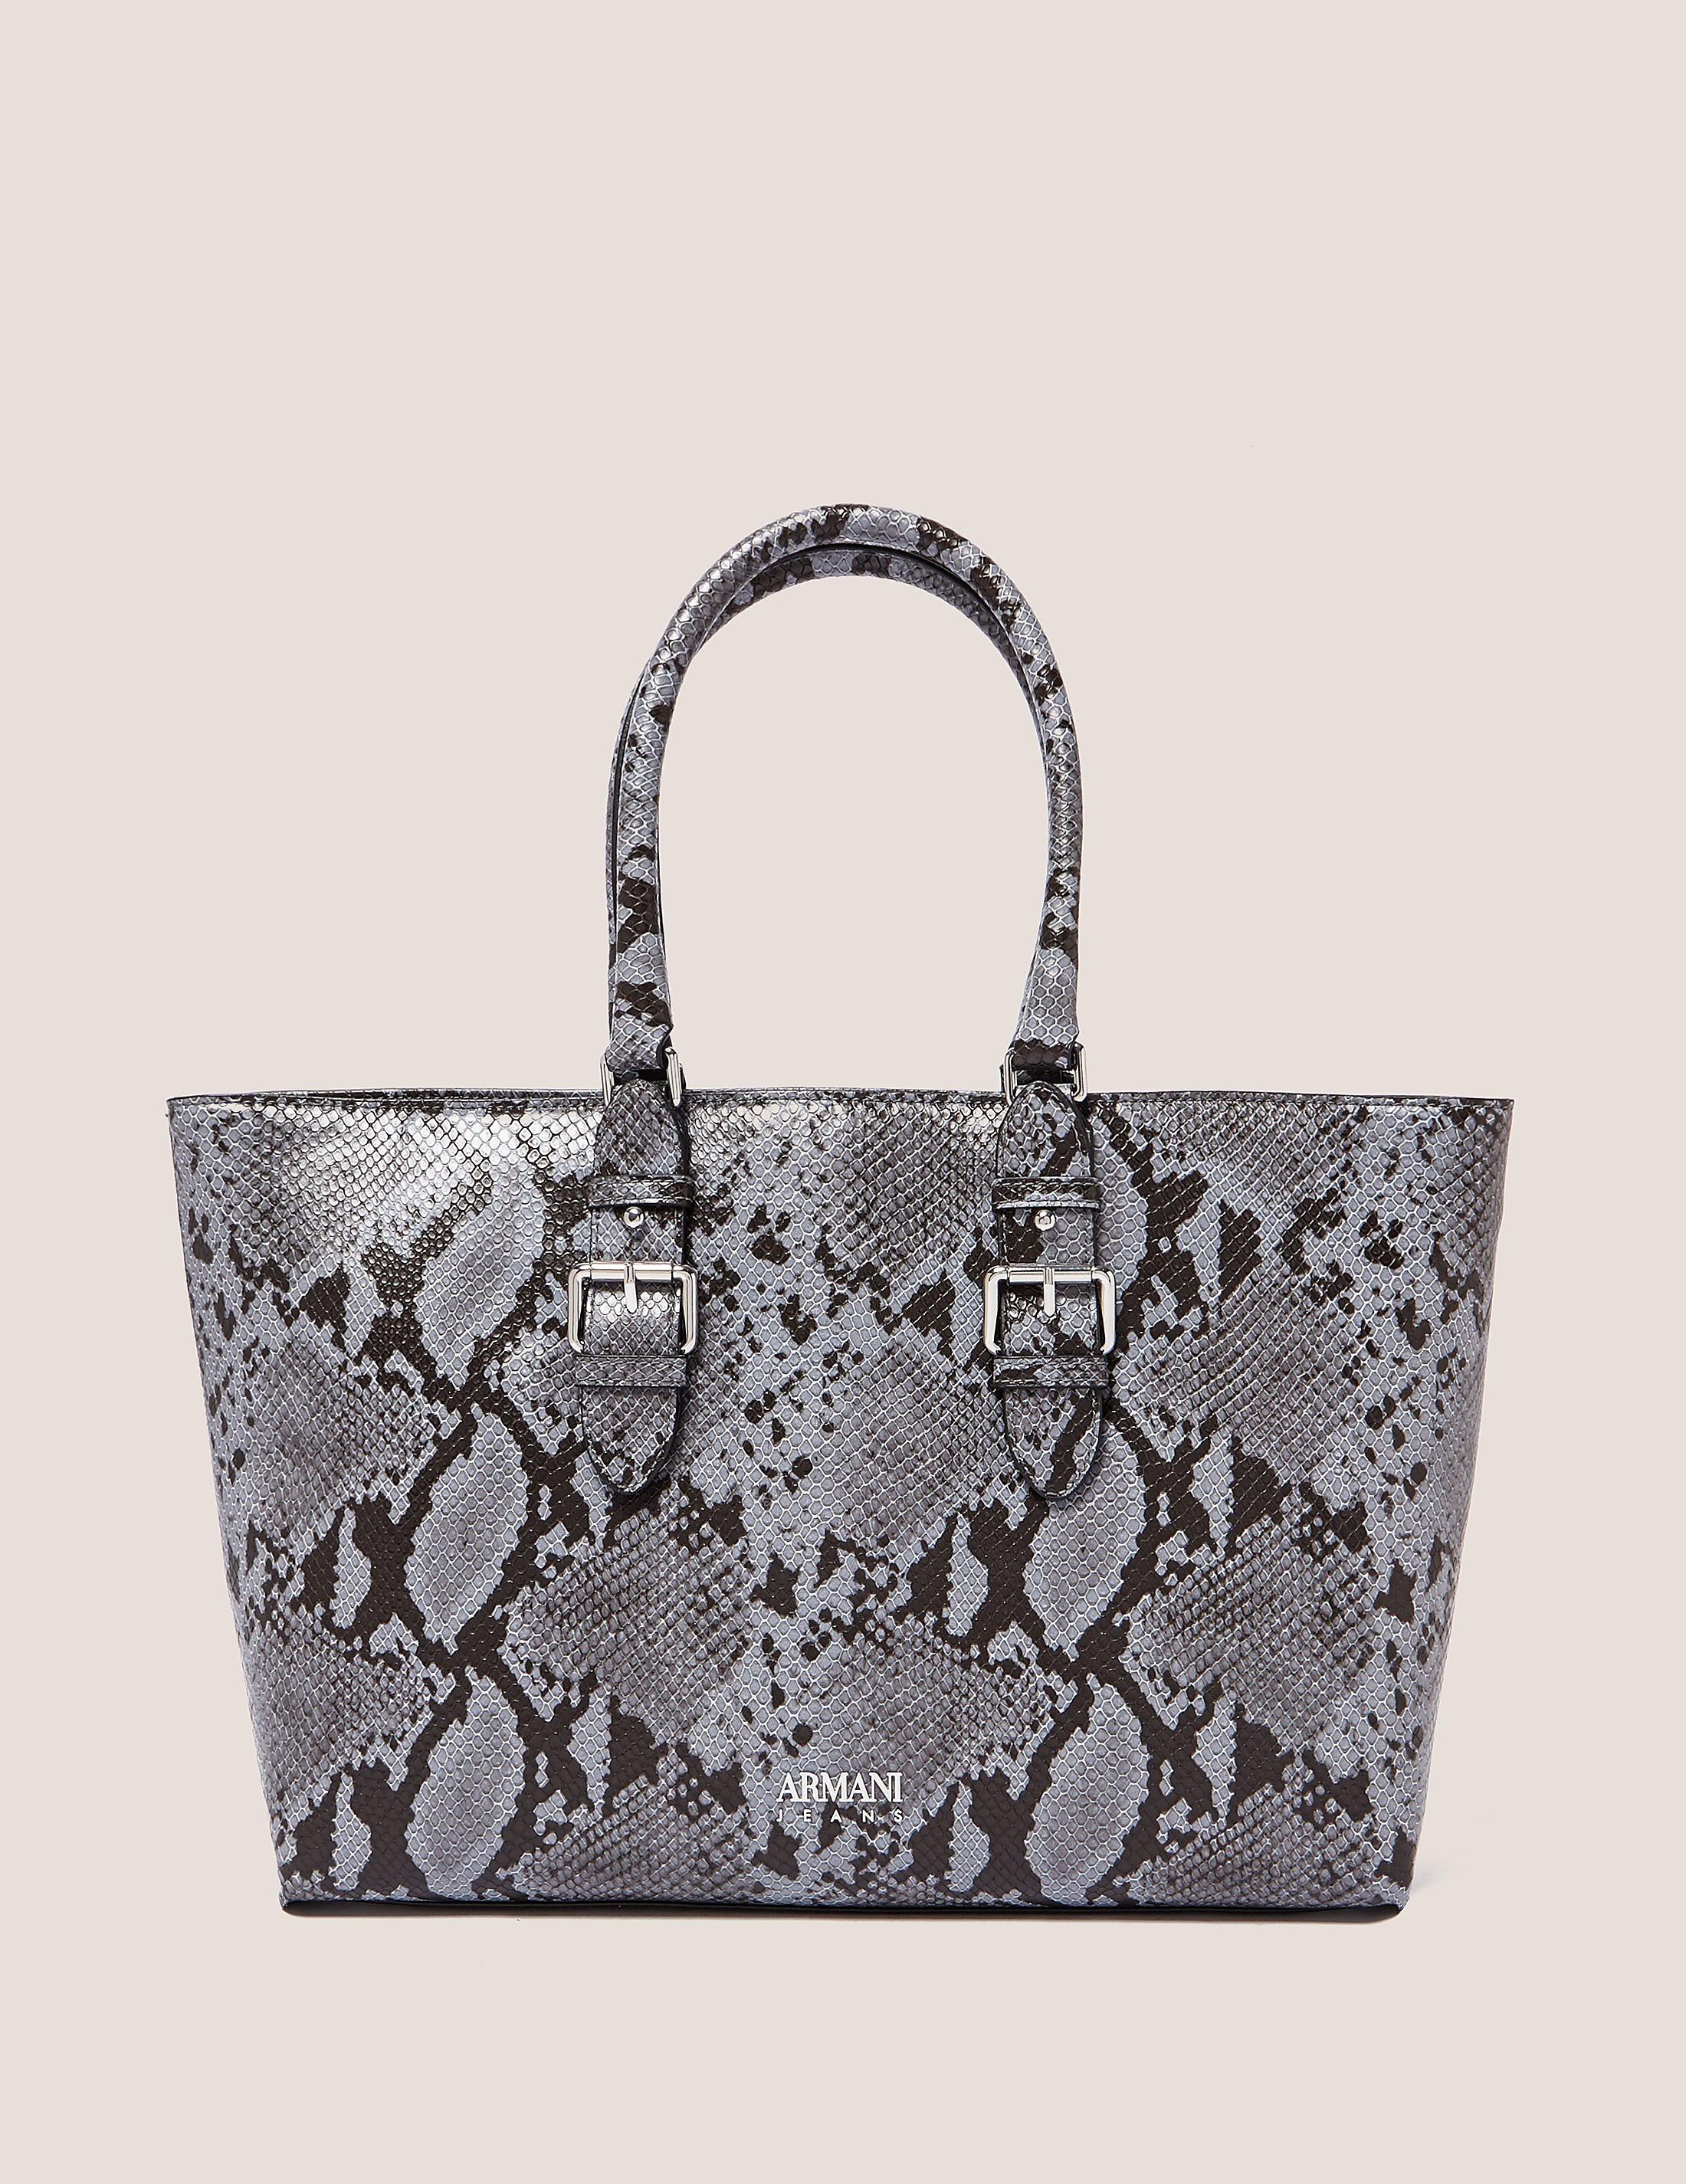 Armani Jeans Snakeskin Shopper Bag